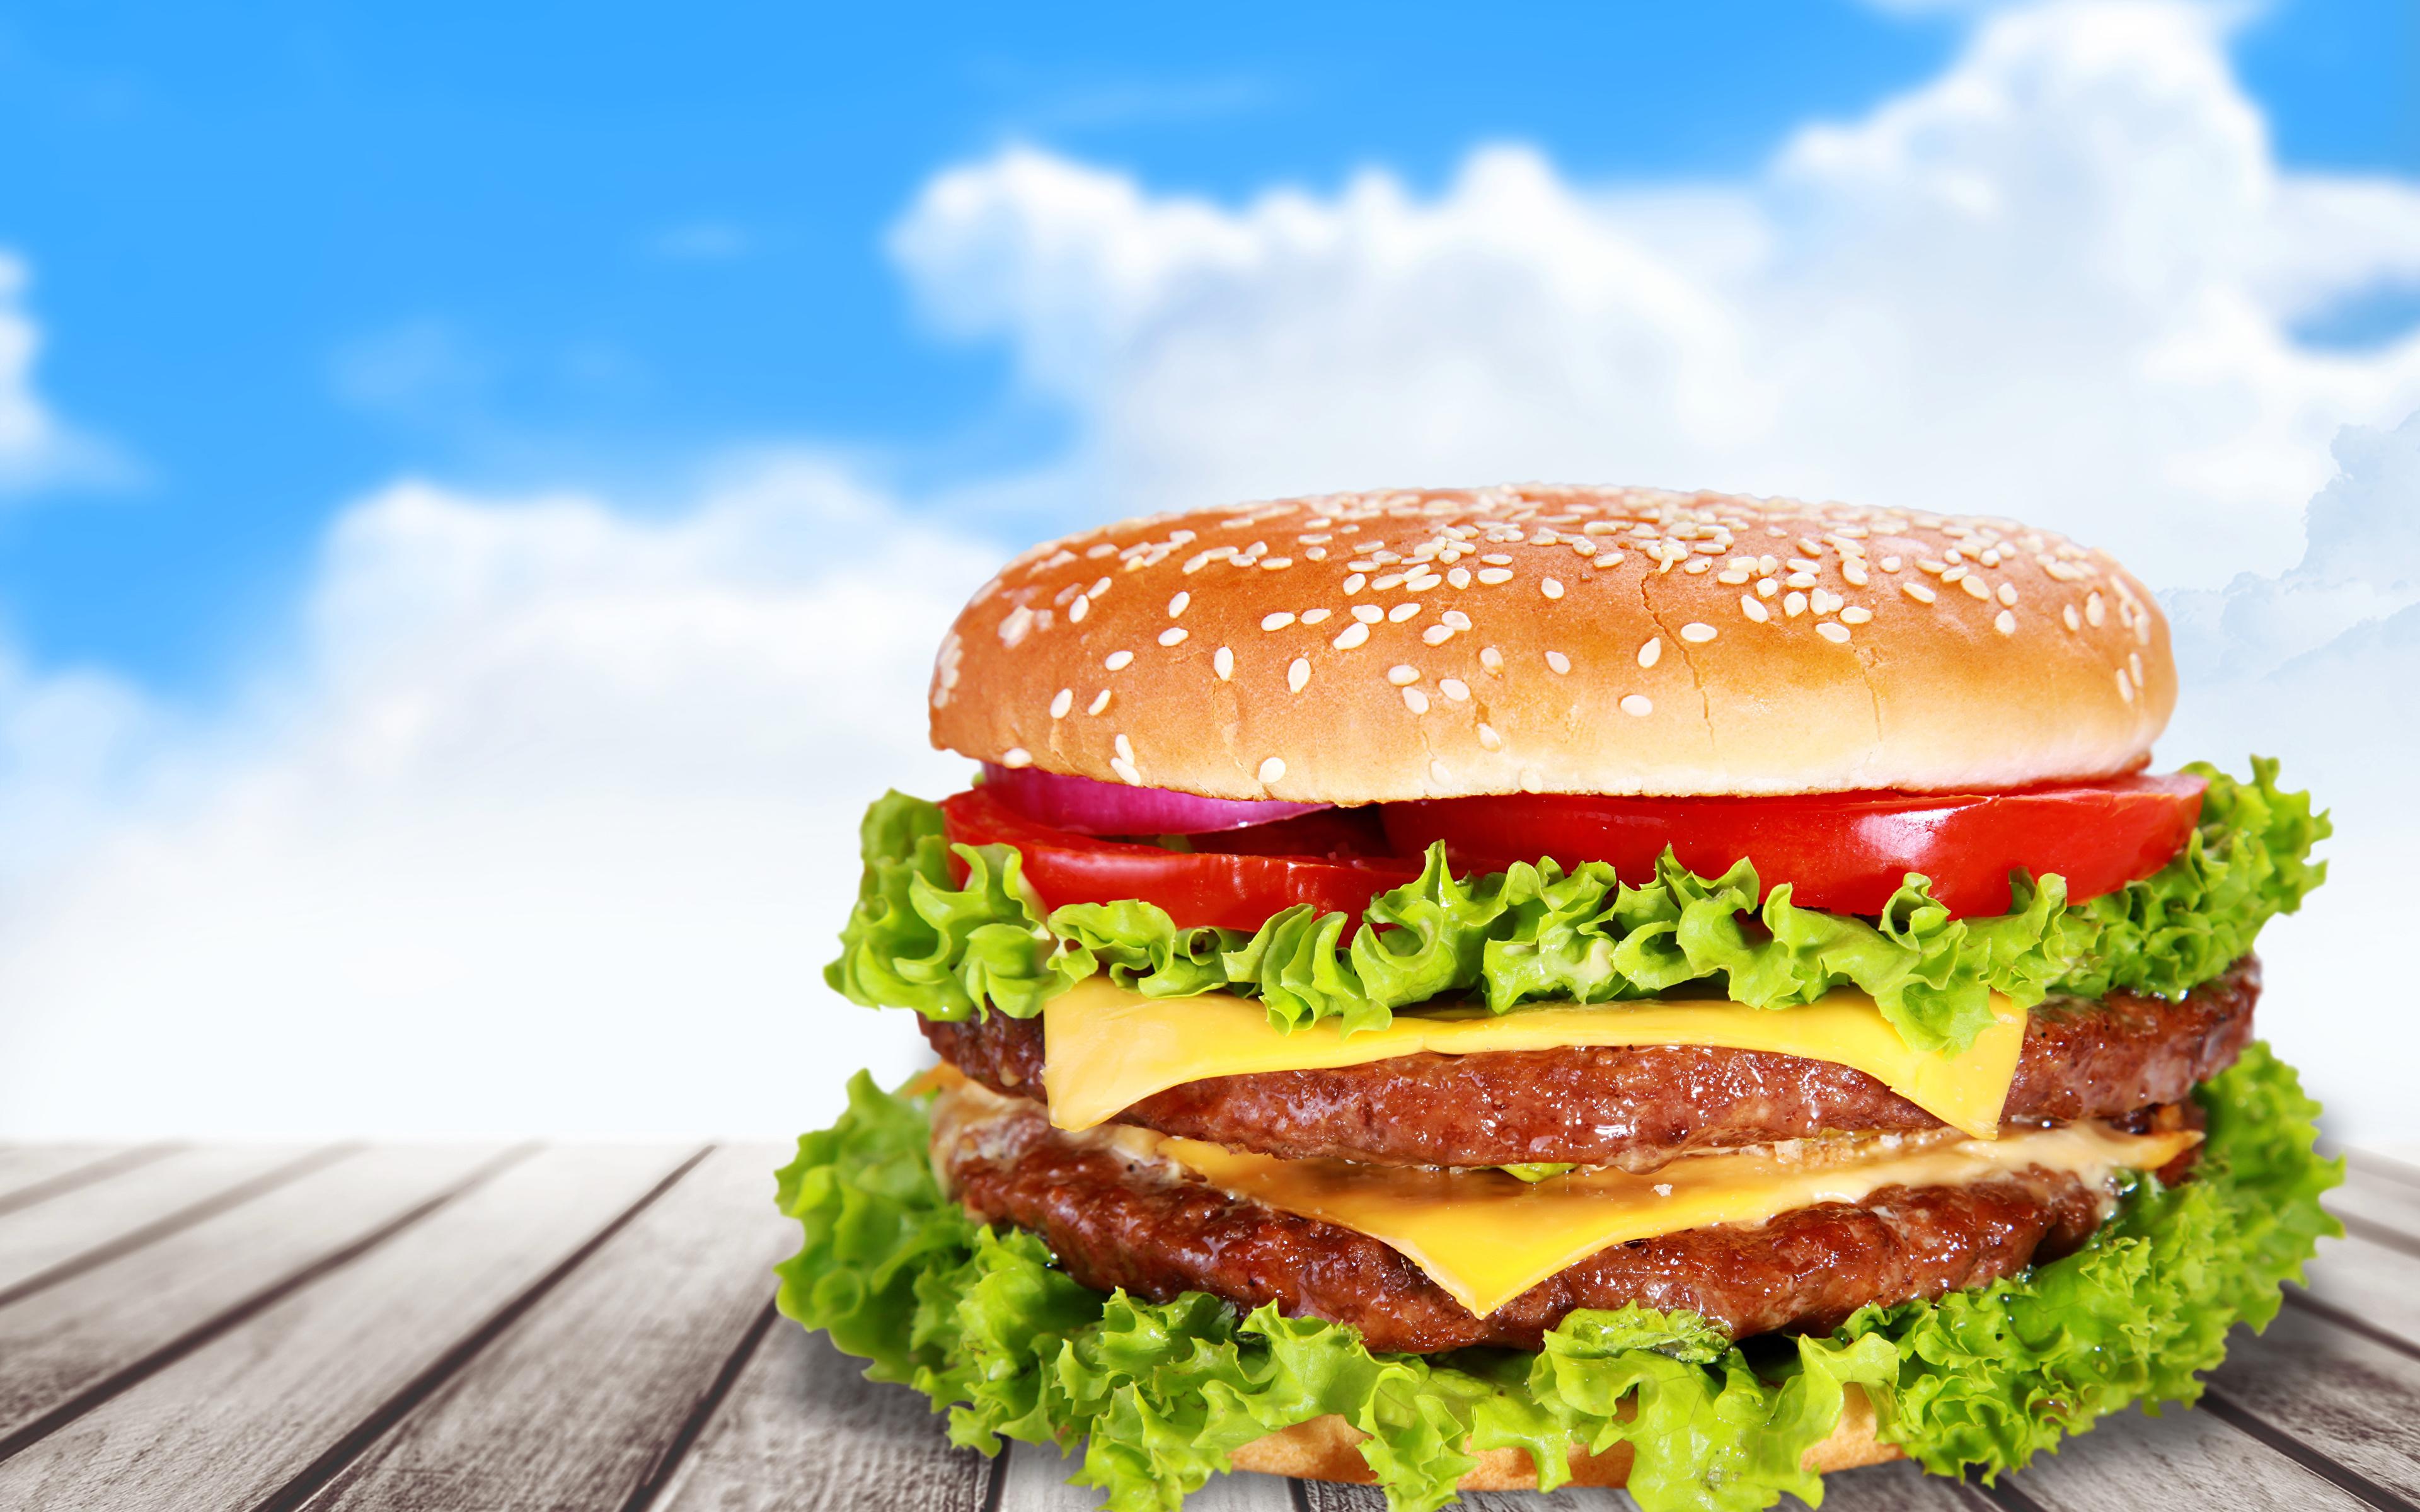 Fotos Hamburger Fast food Gemüse Lebensmittel Bretter 3840x2400 Burger